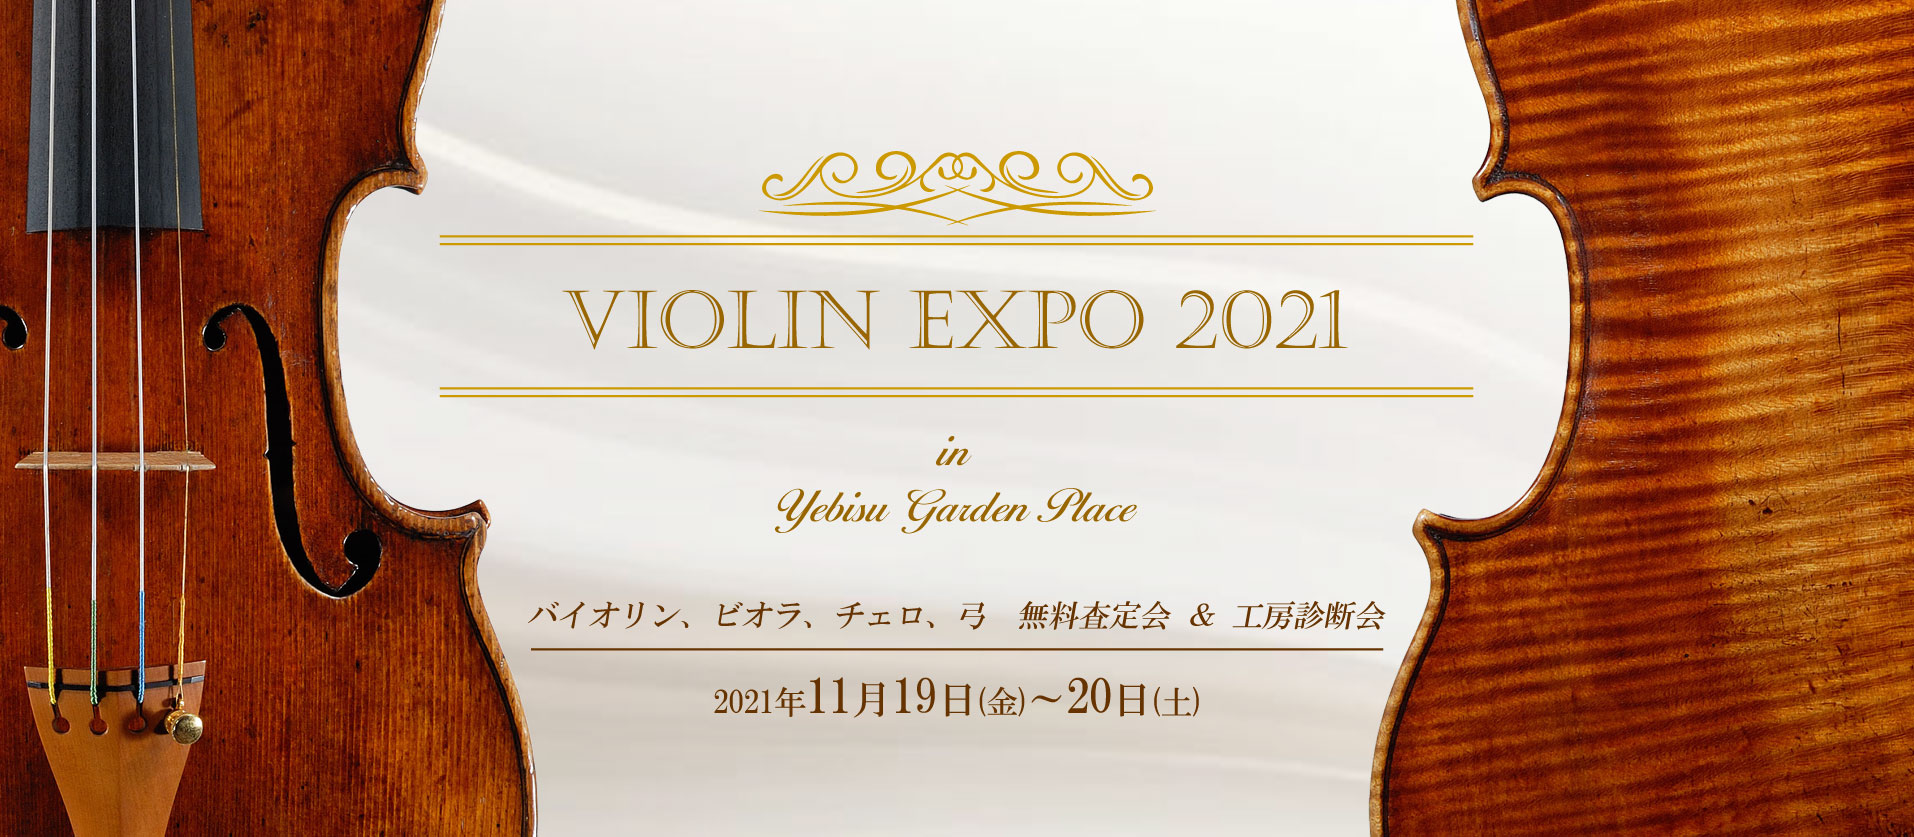 Violin Exop 2021